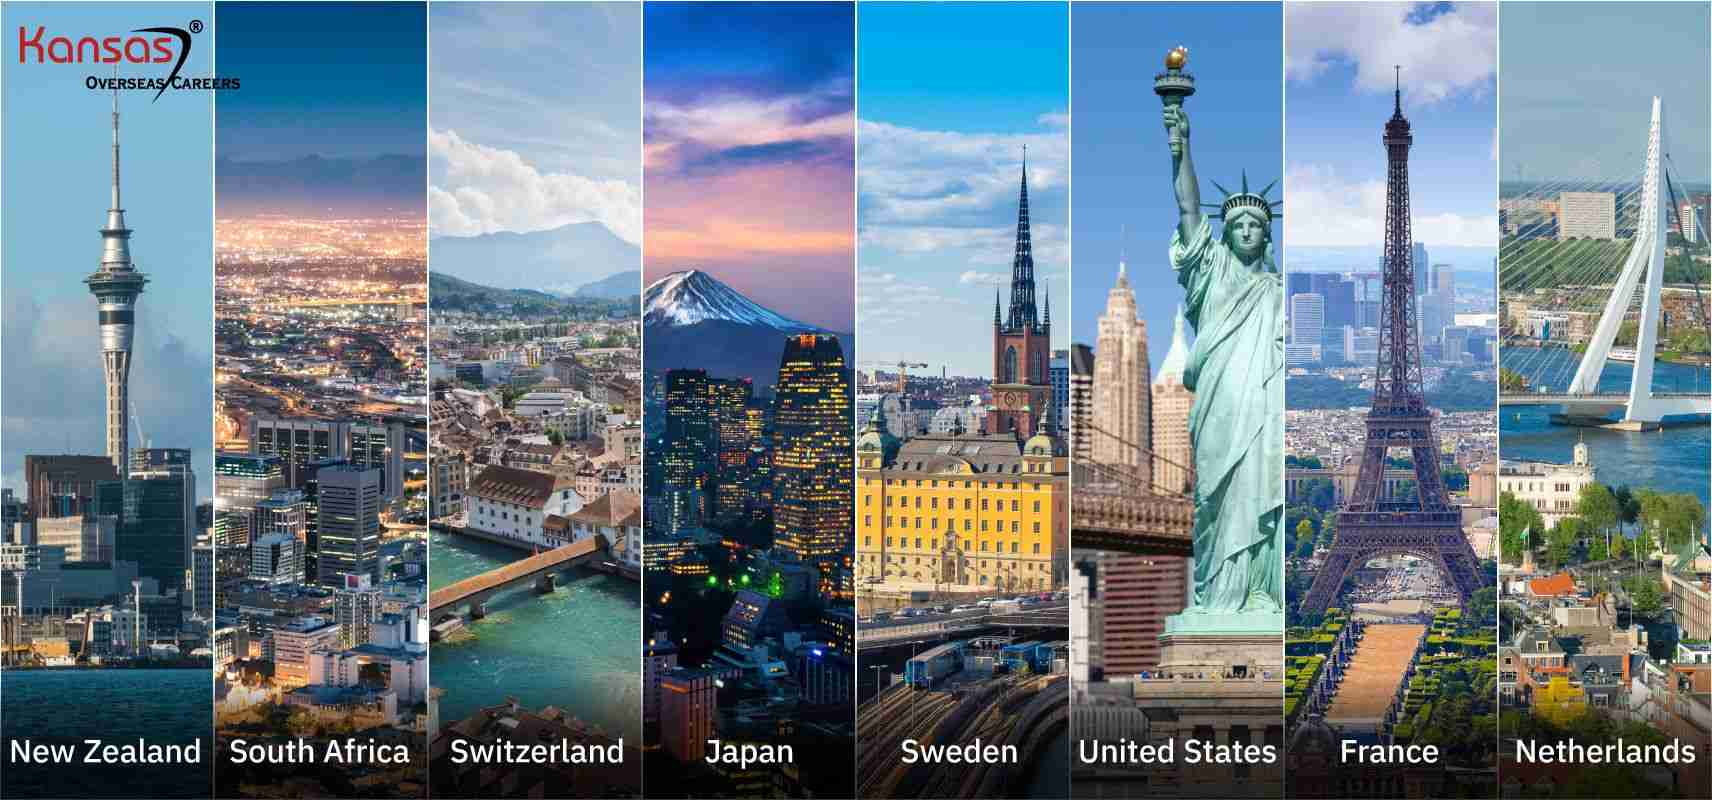 new zealand-south africa-switzerland-japan-sweden-united states-france-netherlands